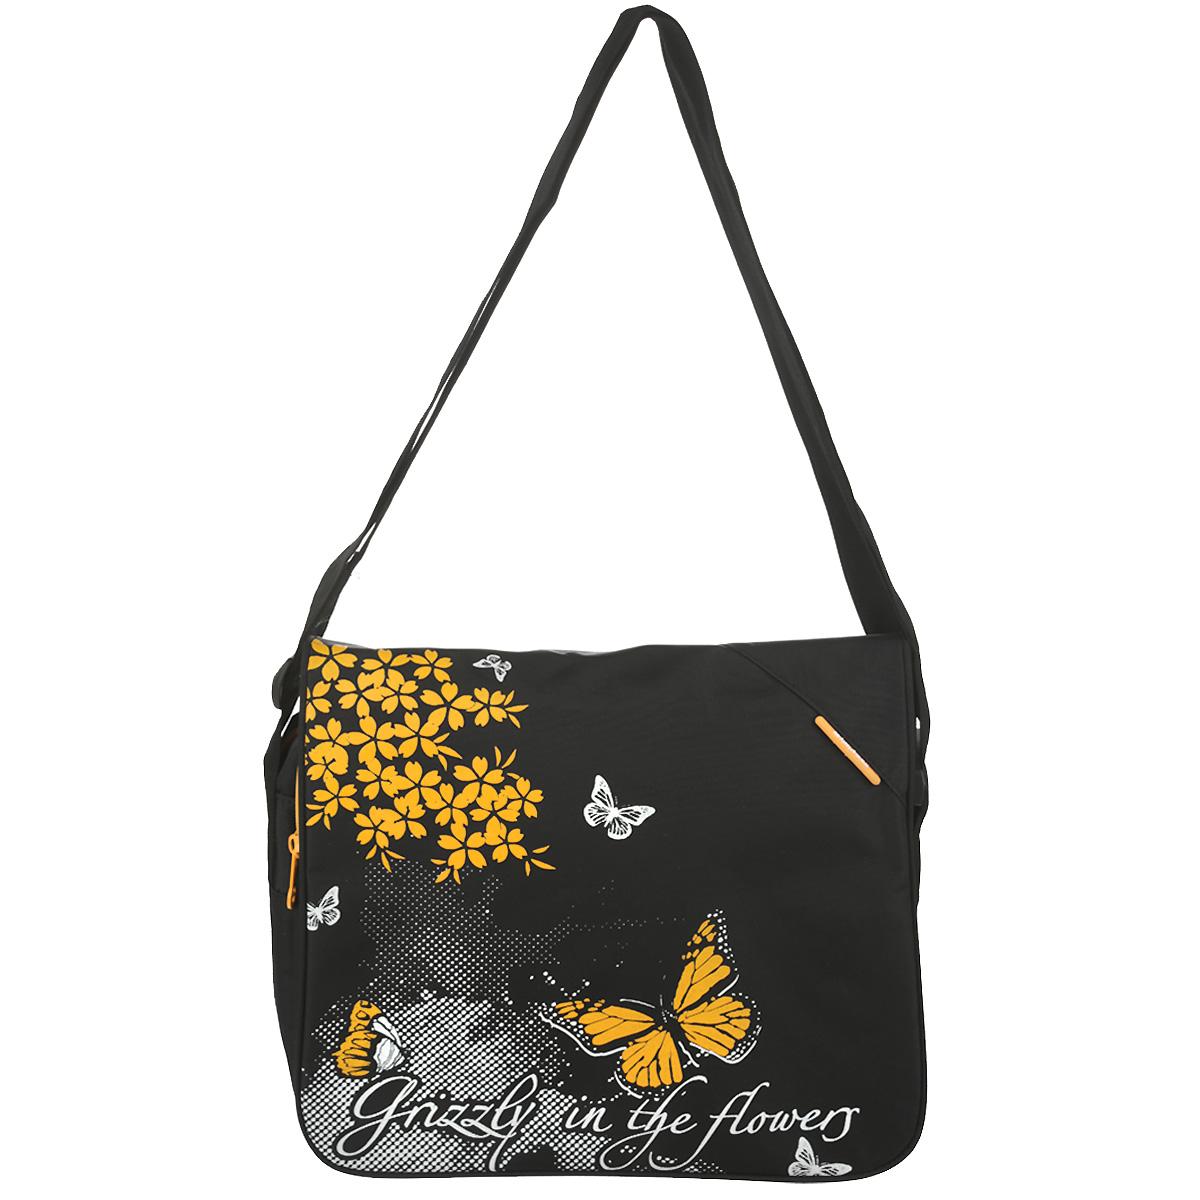 Сумка школьная  Grizzly , цвет: черный, желтый. MD-353-1 -  Ранцы и рюкзаки